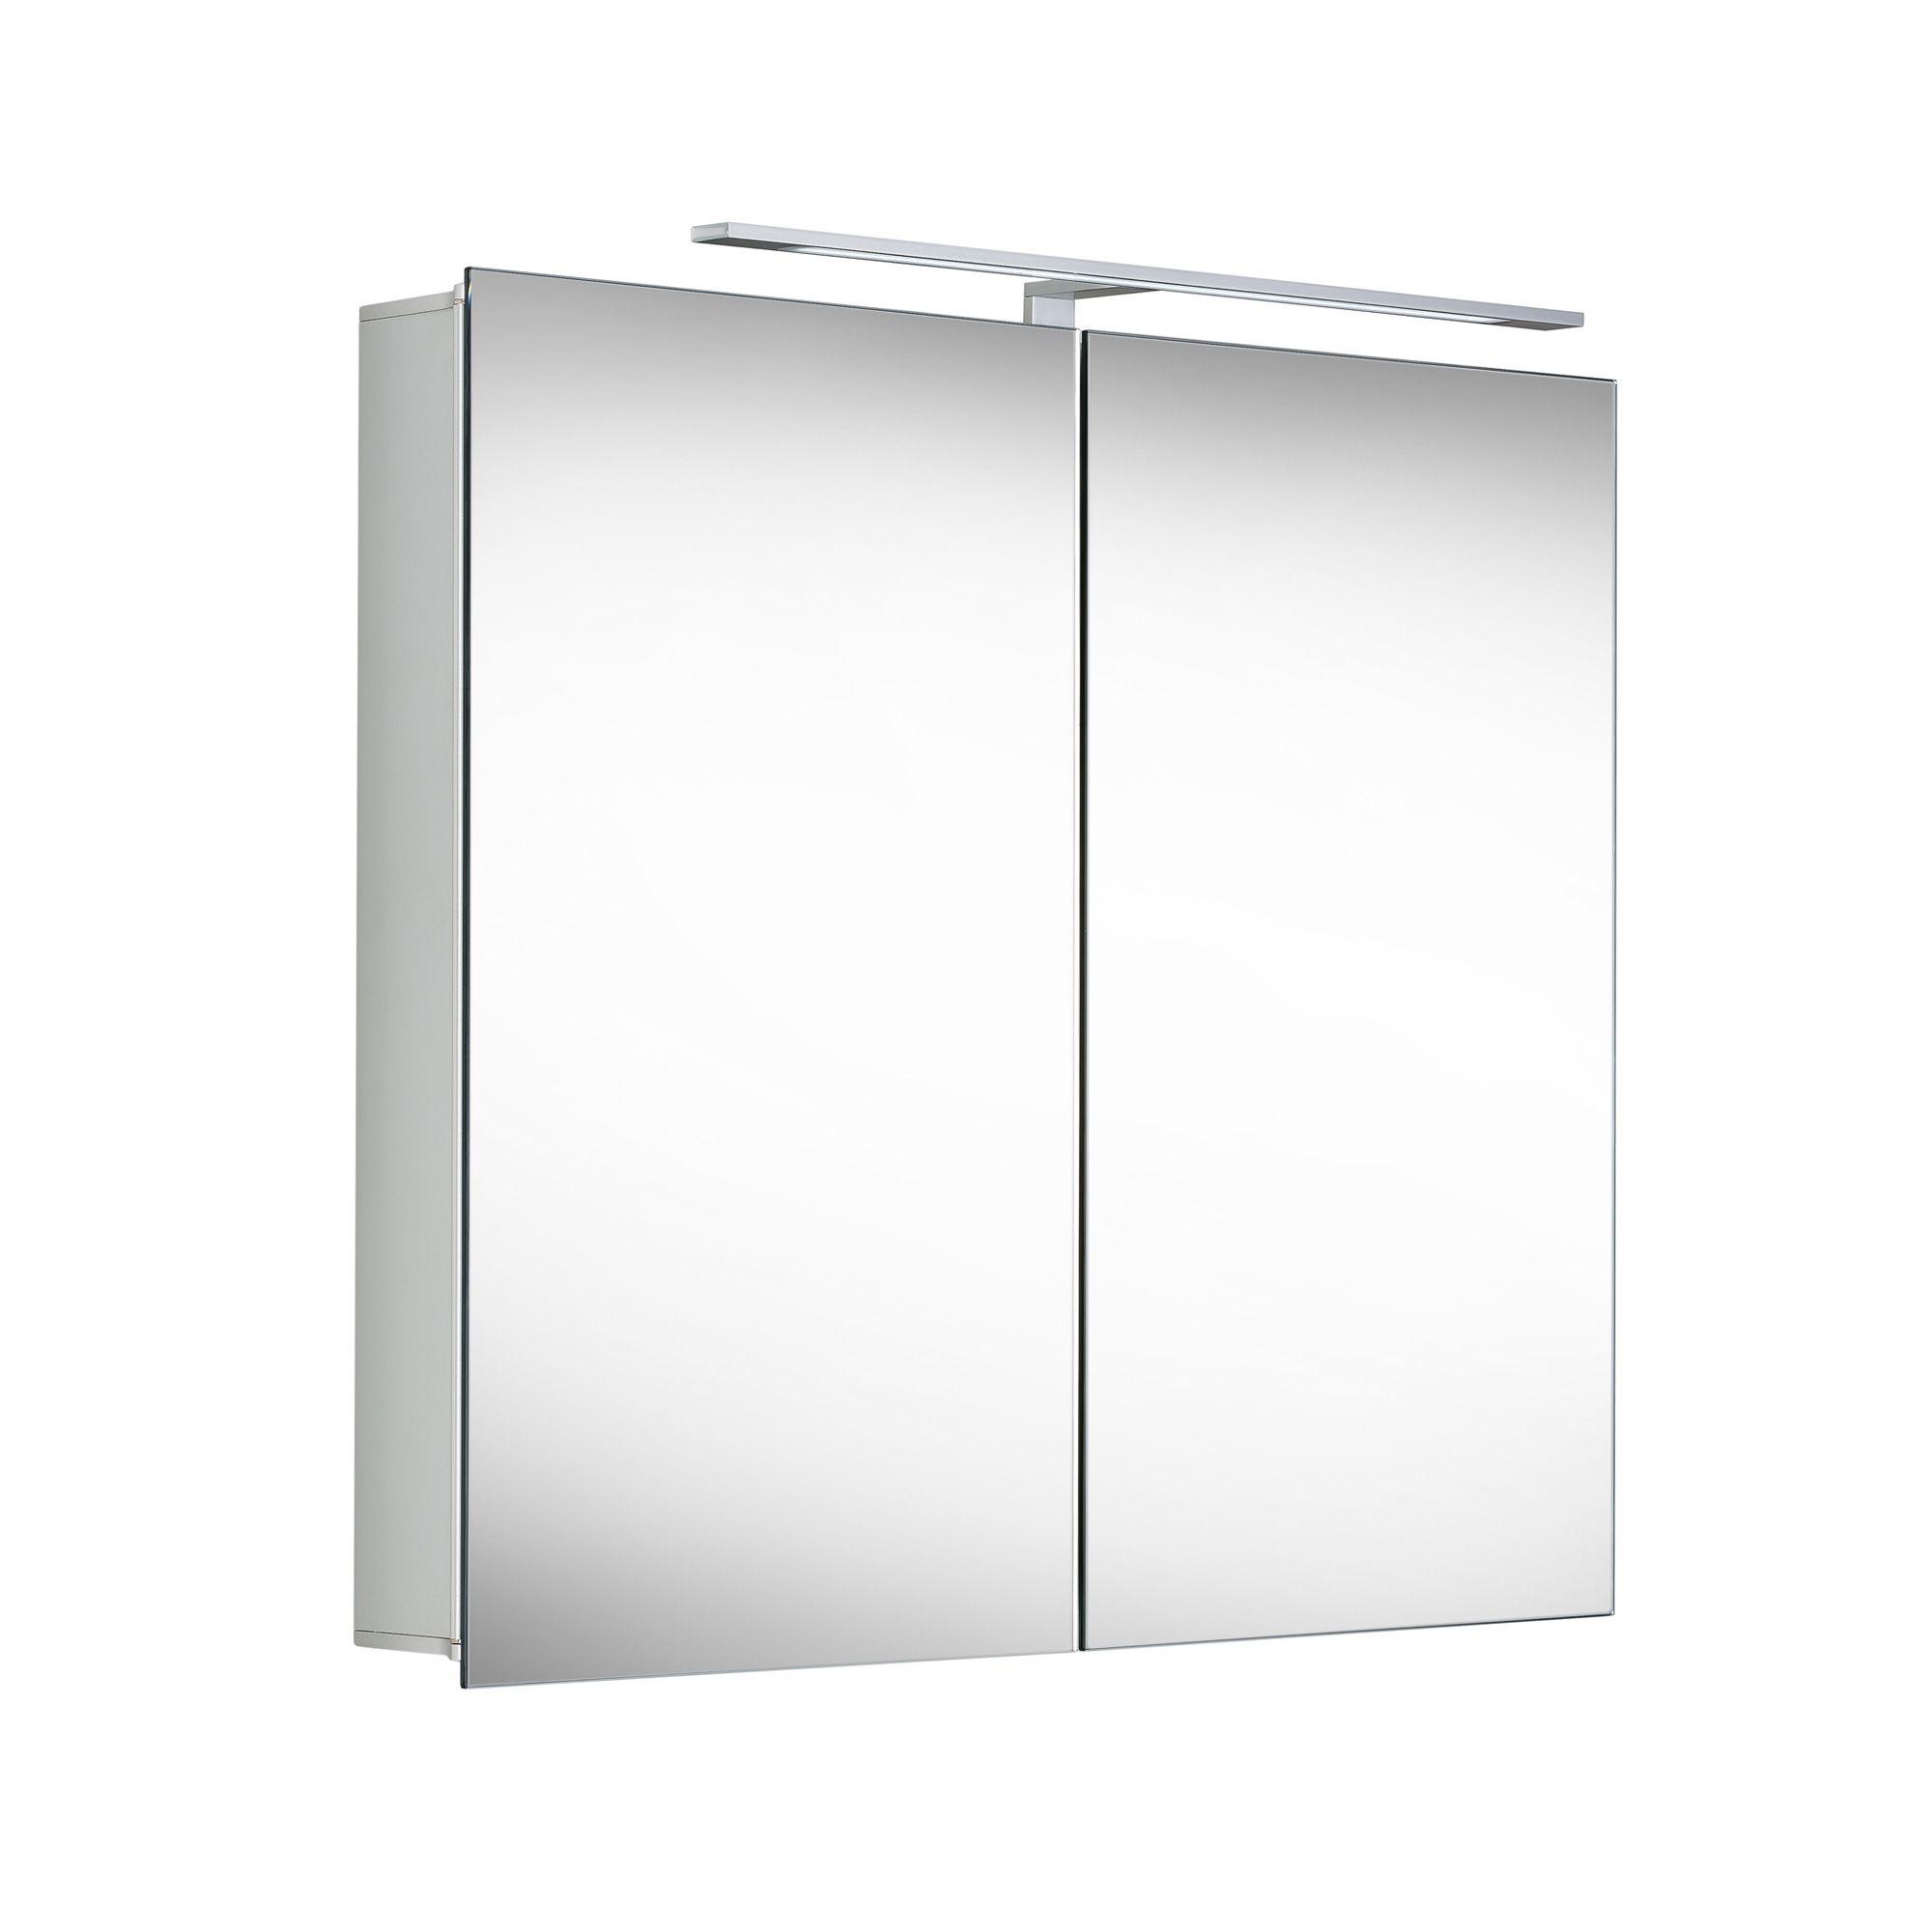 Matedo Entry Sps Spiegelschrank B 80 H 70 T 12 Cm Mit Led Beleuchtung Sp S80 Home Decor Decor Furniture